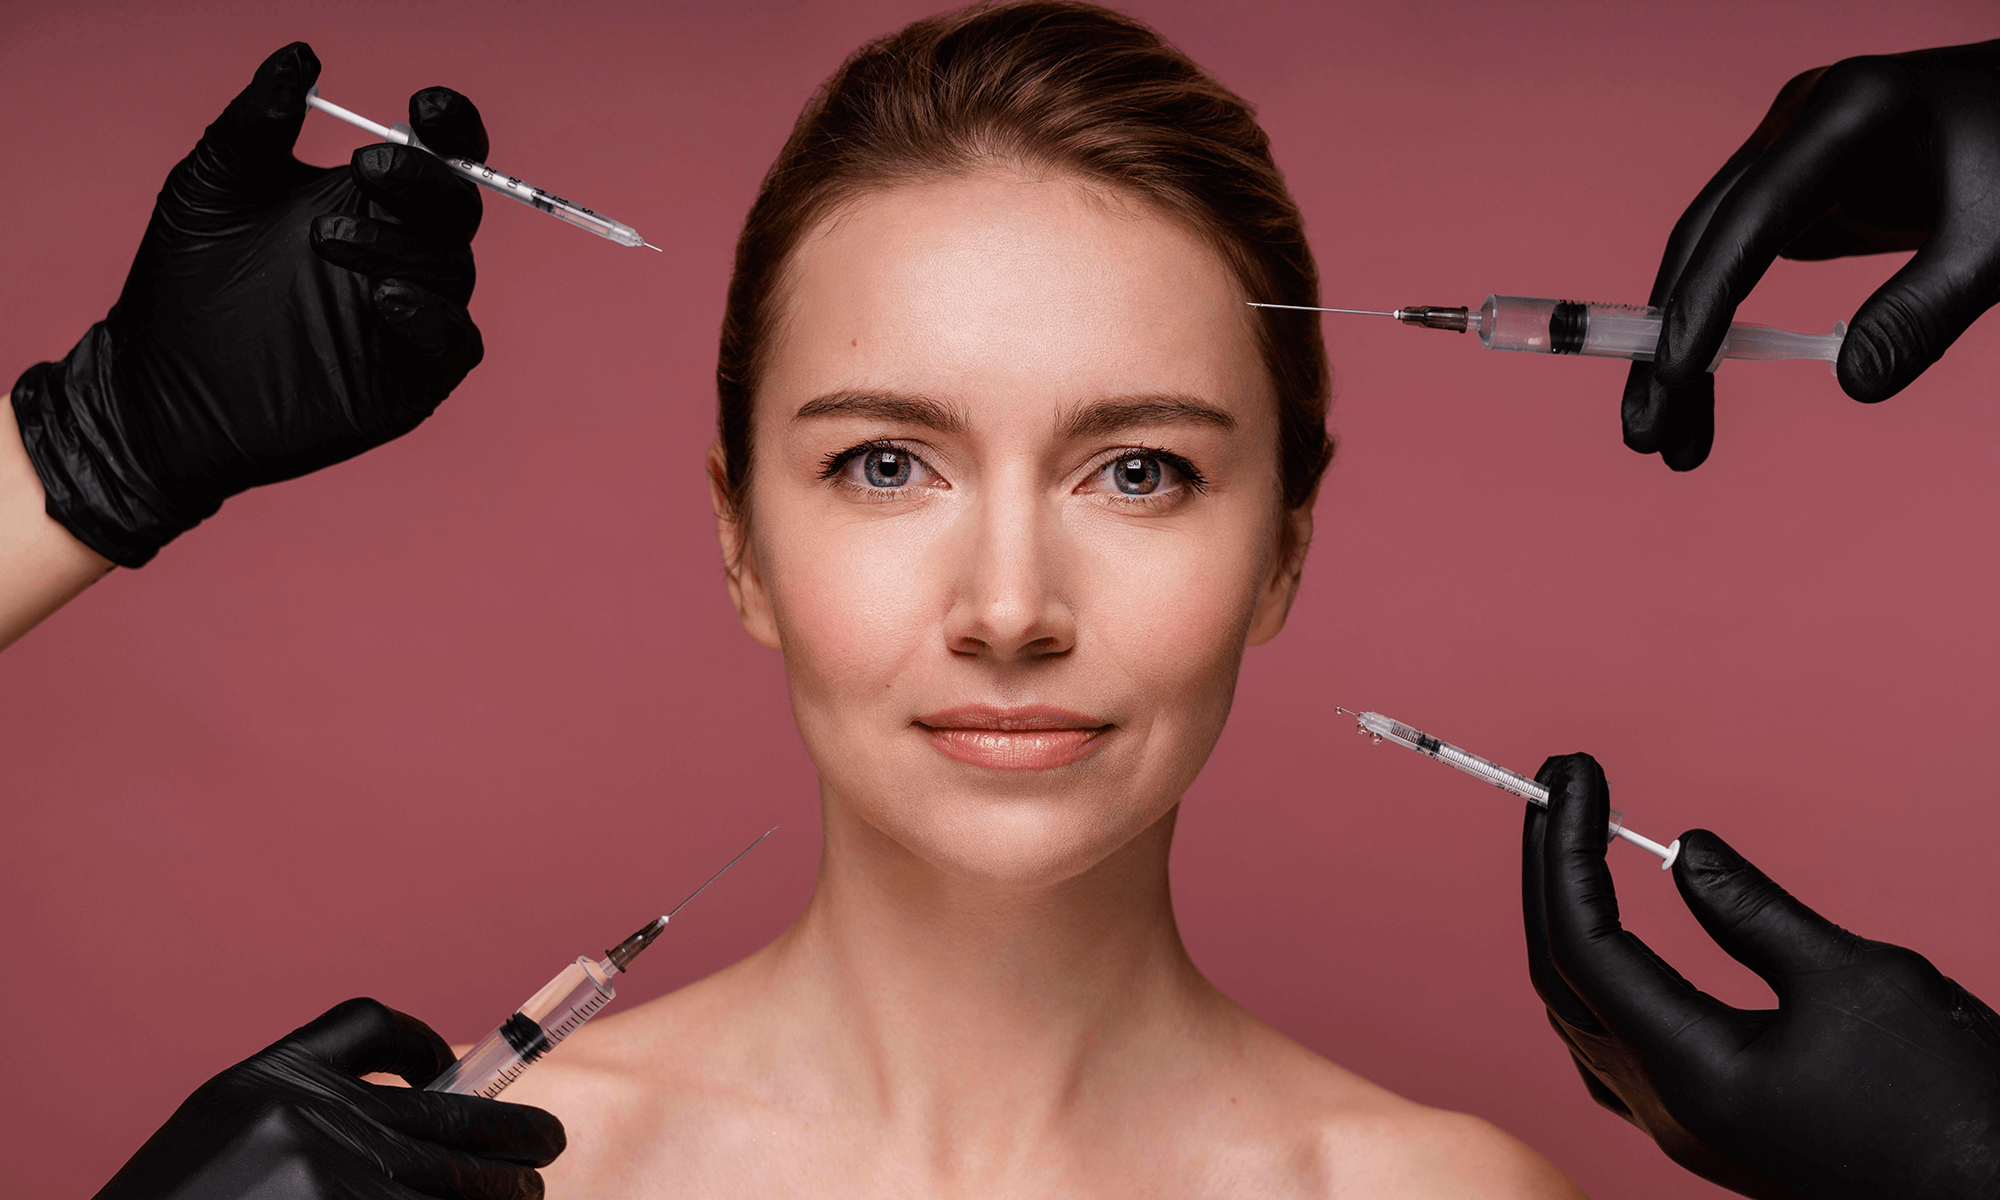 asimetria faciala tratament simetrie acid hialuronic botox dermatologie craiova medlink center